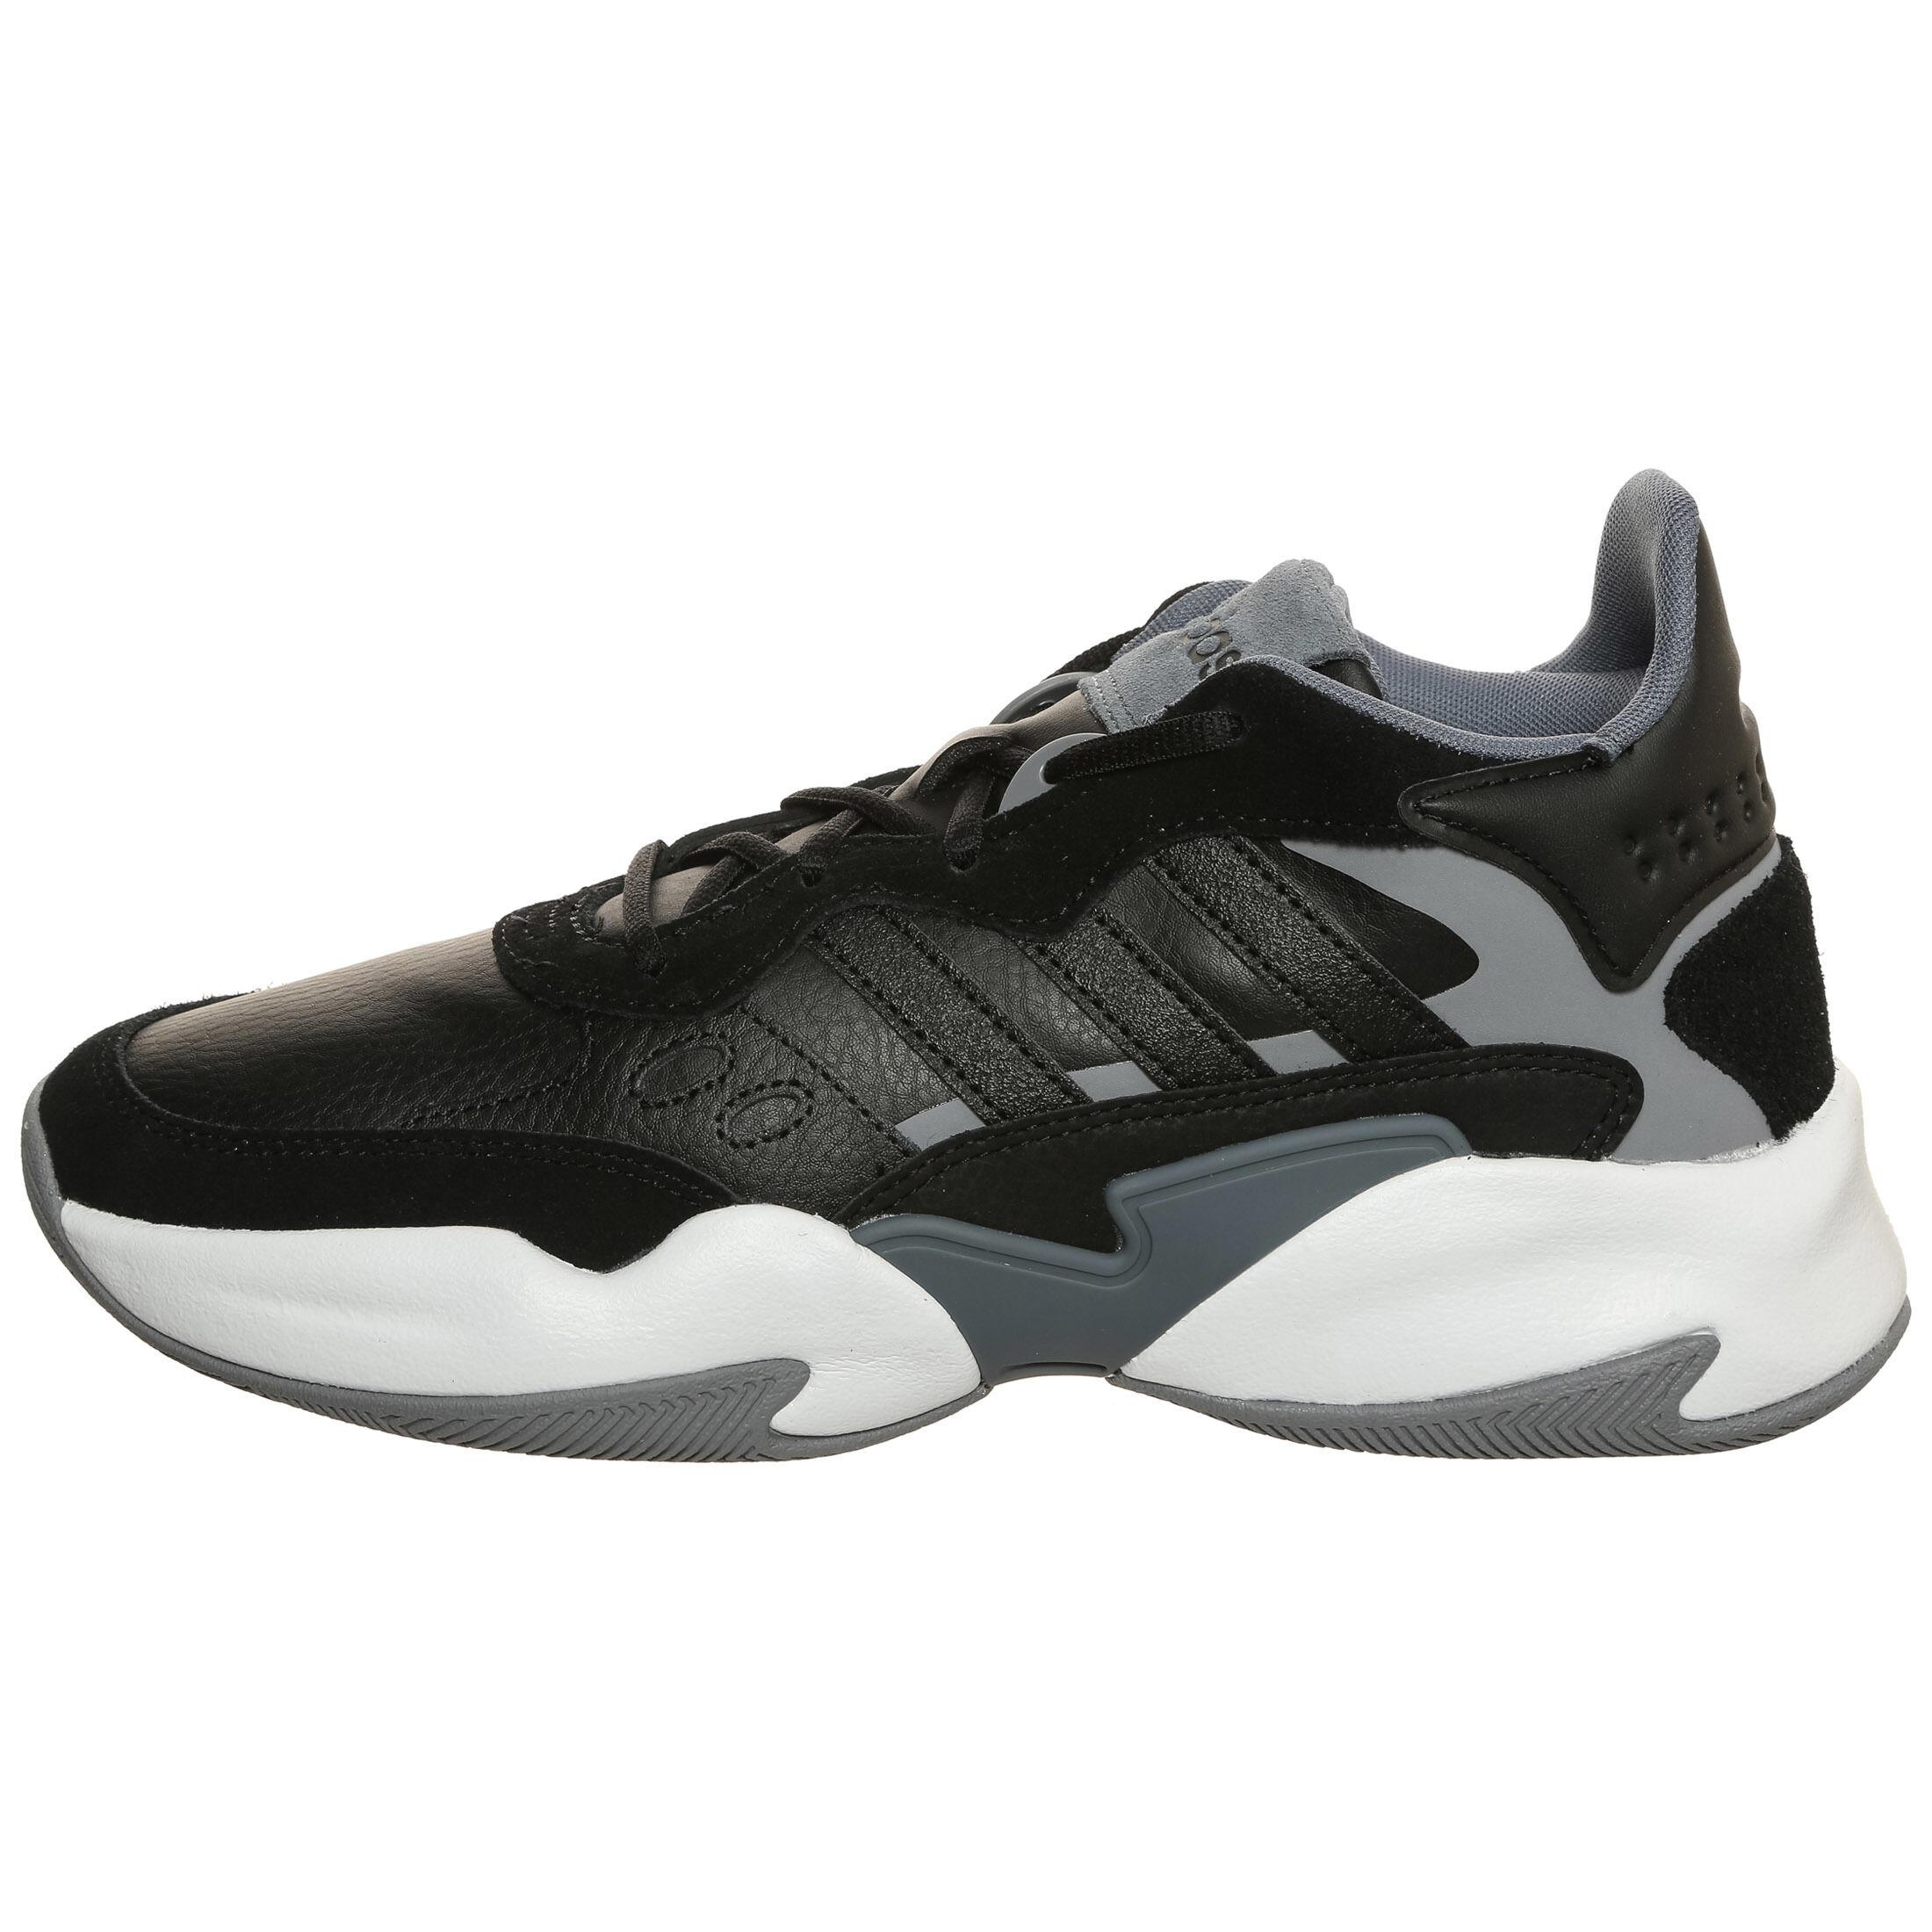 adidas Performance Streetspirit 2.0 Sneaker Herren bei OUTFITTER B11Py